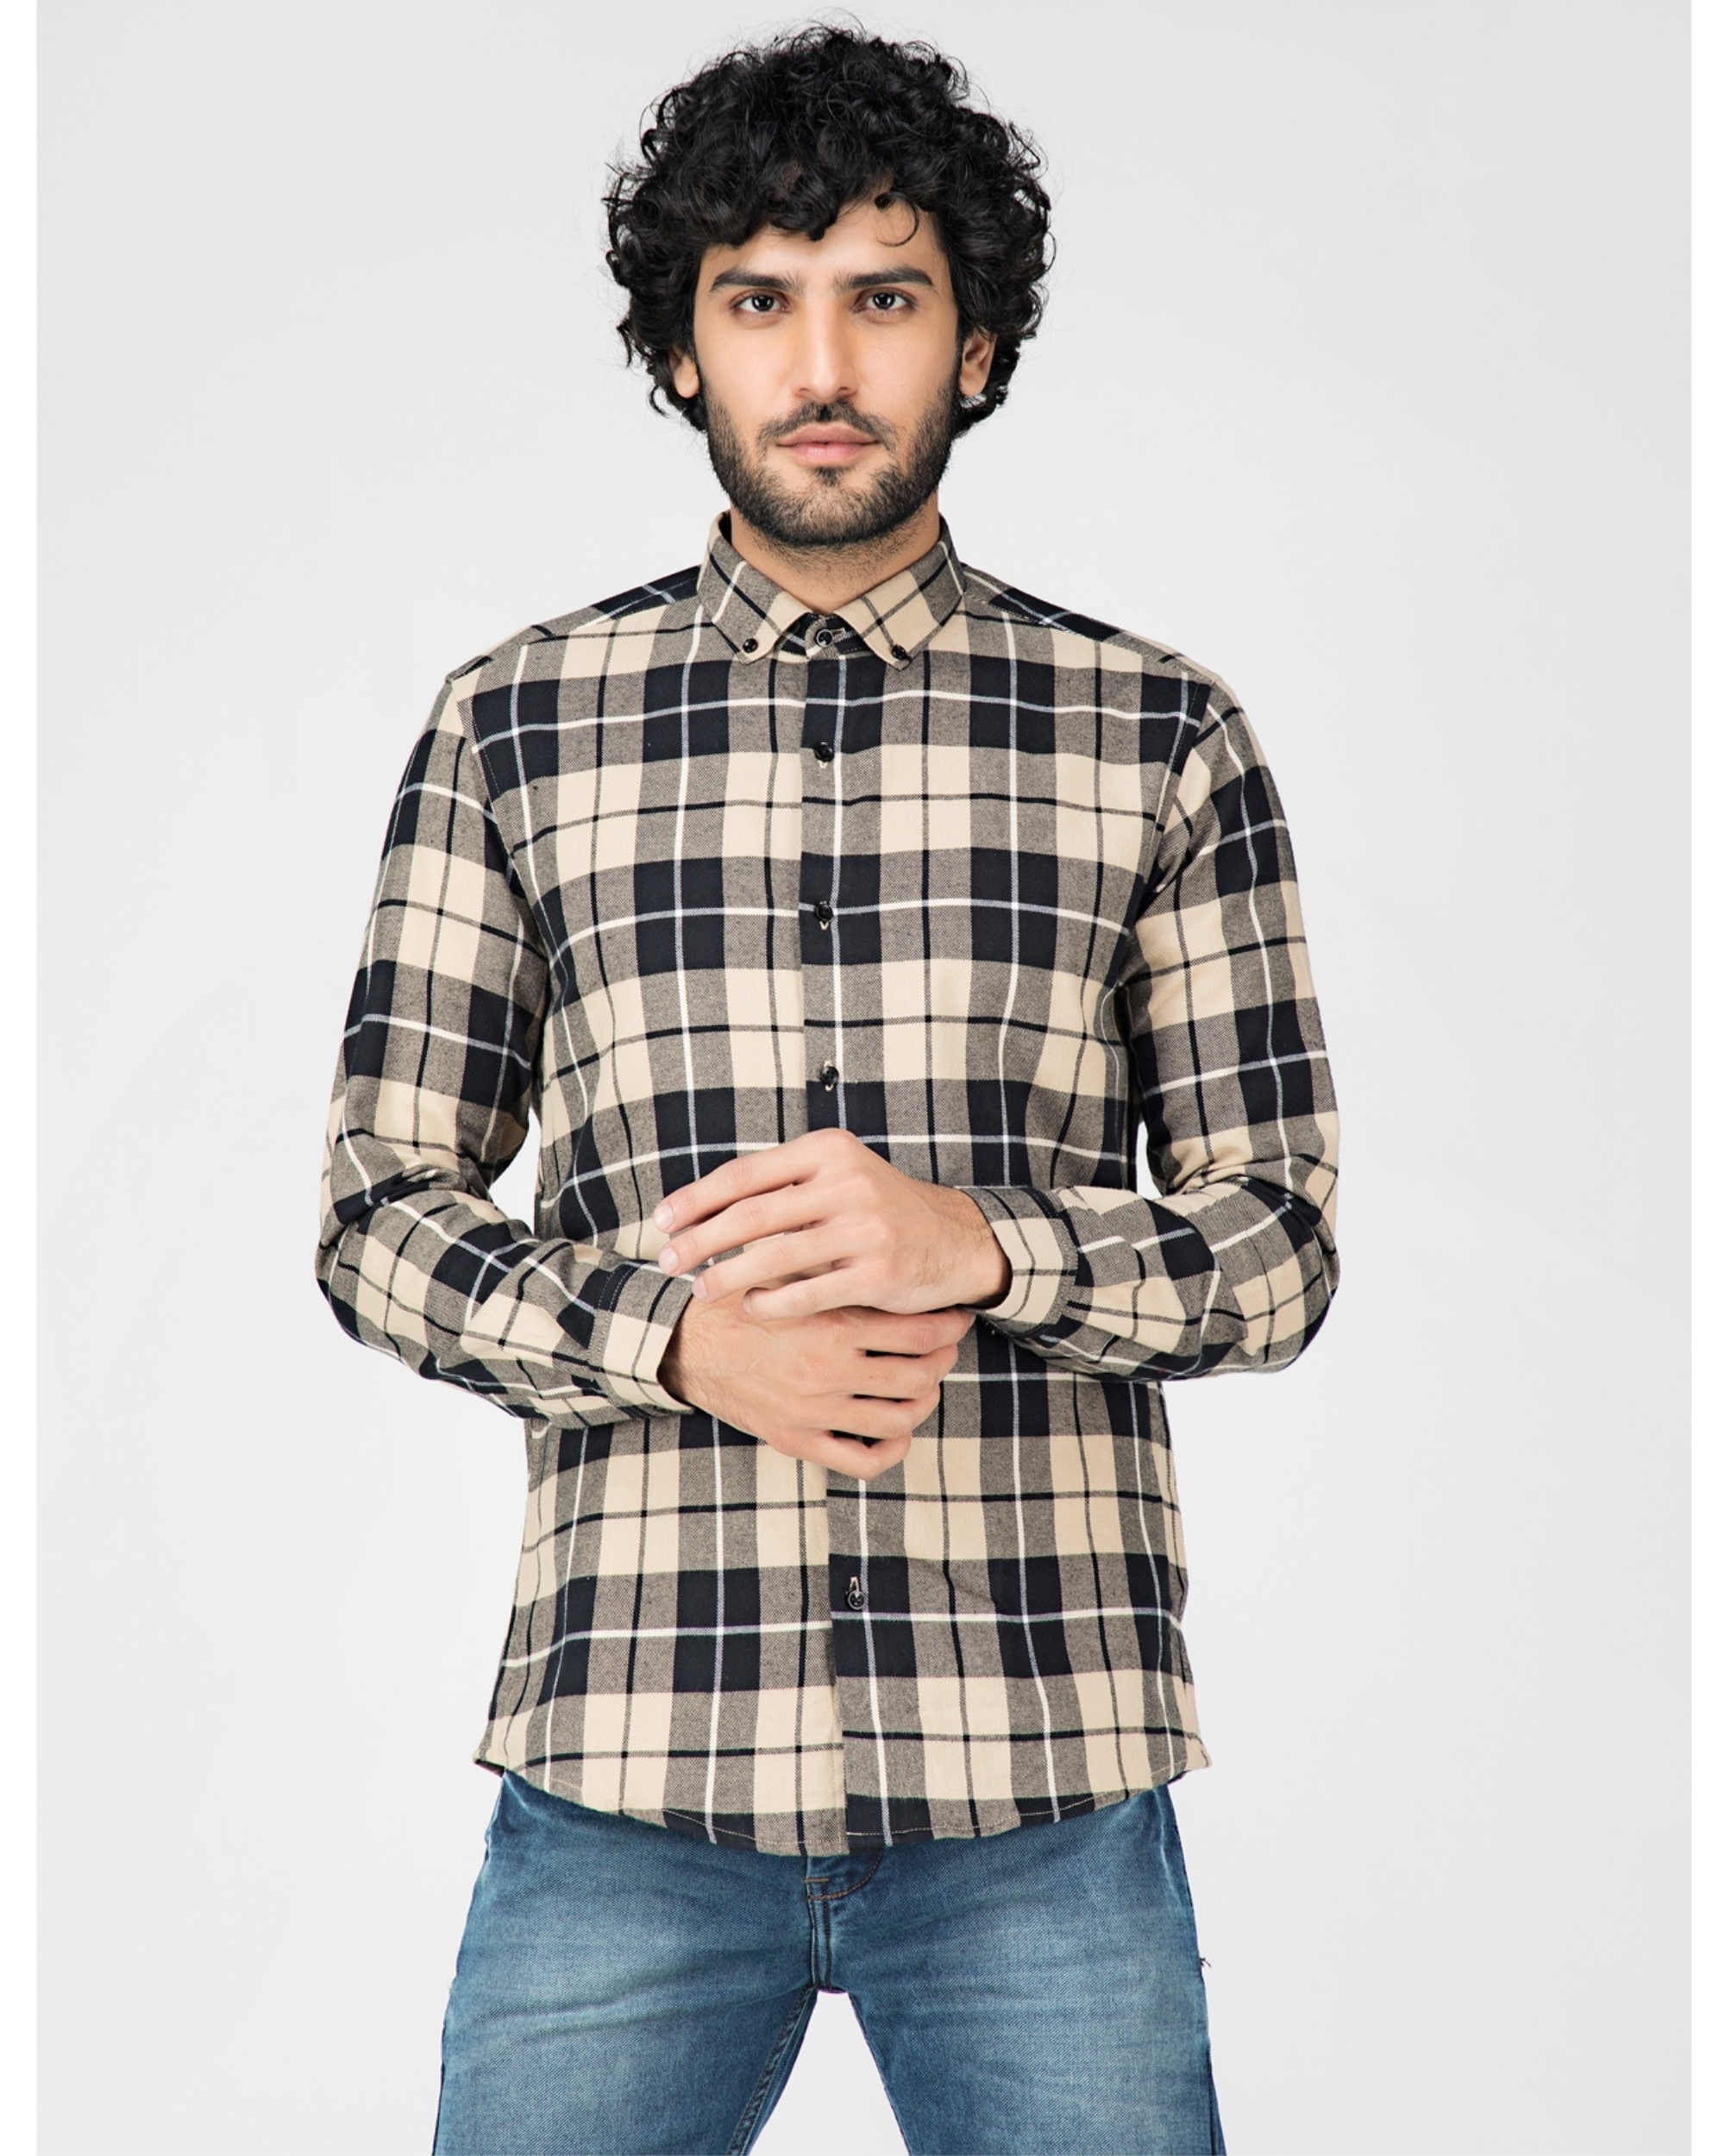 Beige and black tartan checkered shirt